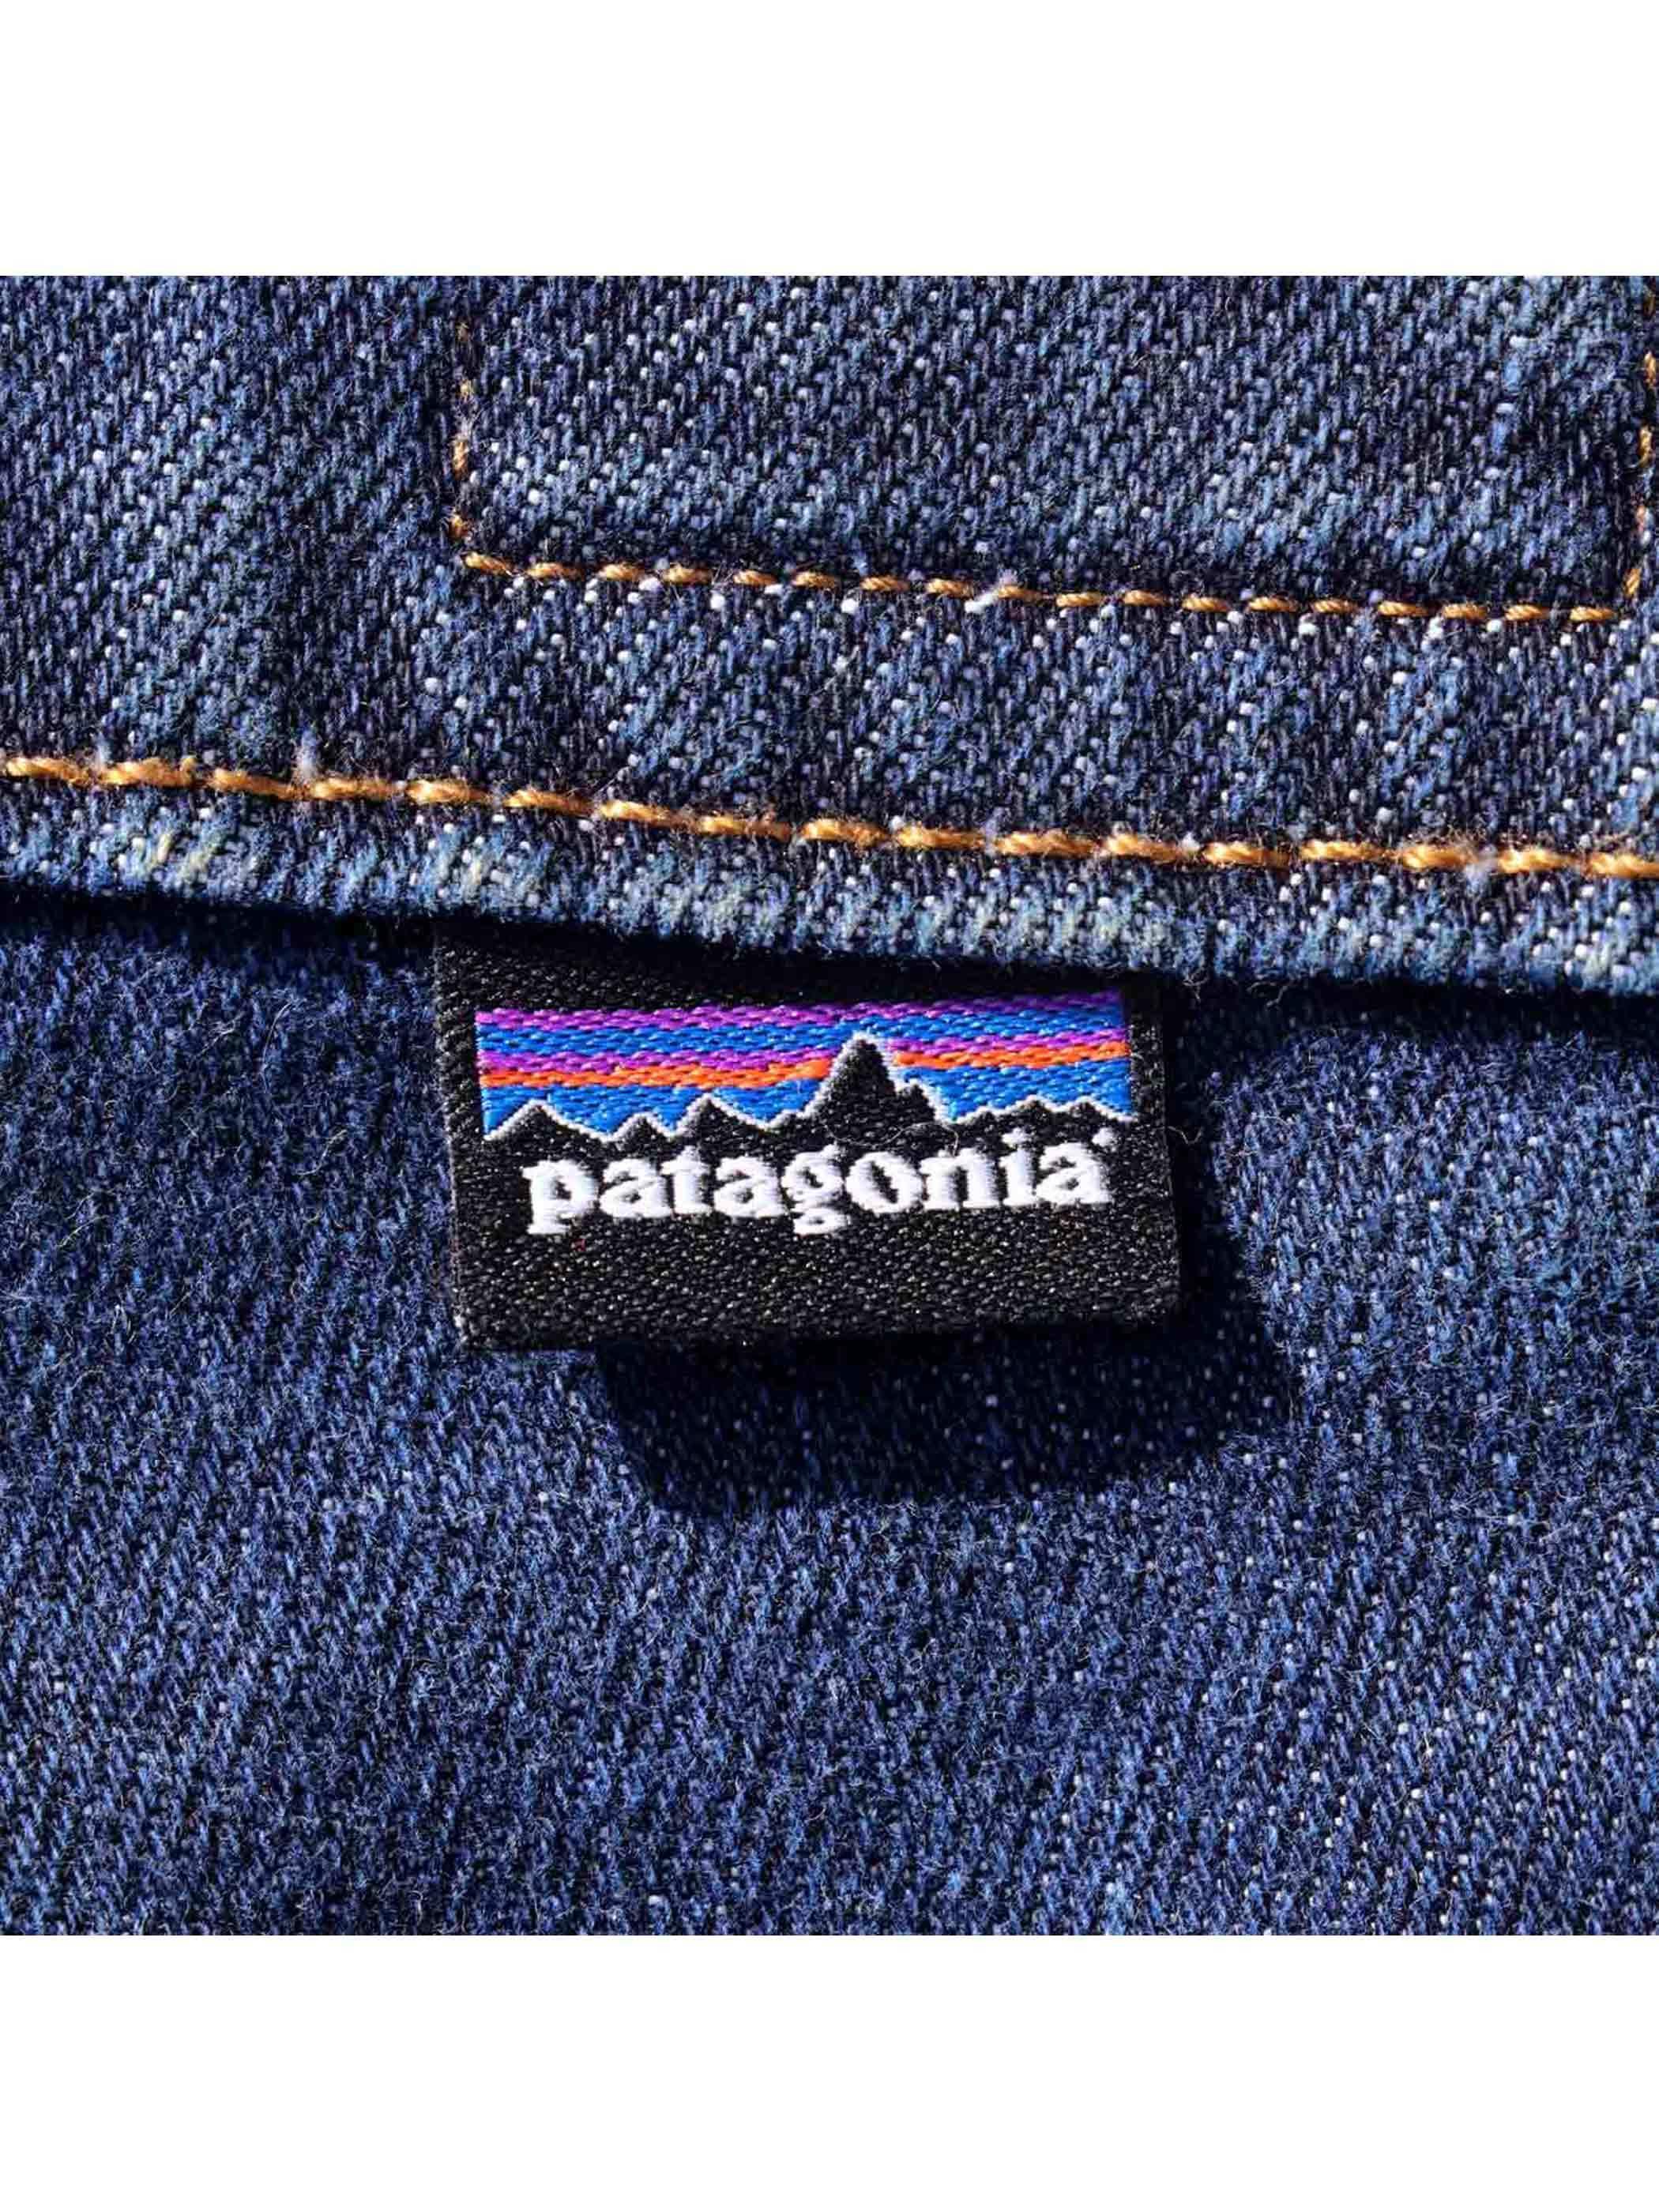 00's~ PATAGONIA オーガニックコットン デニムパンツ [W30]